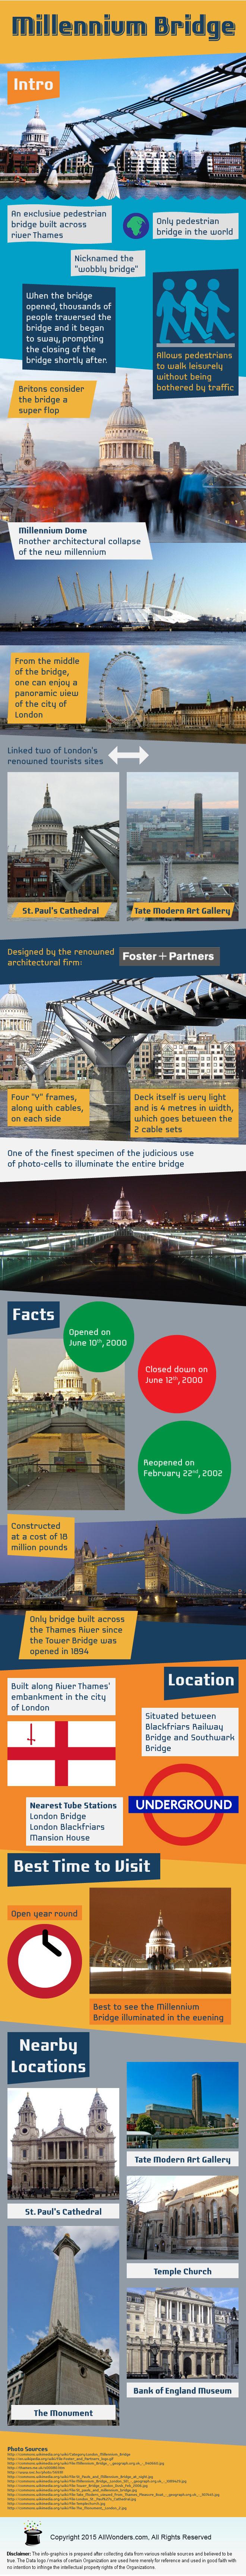 Millennium Bridge, London - Facts & Infographic